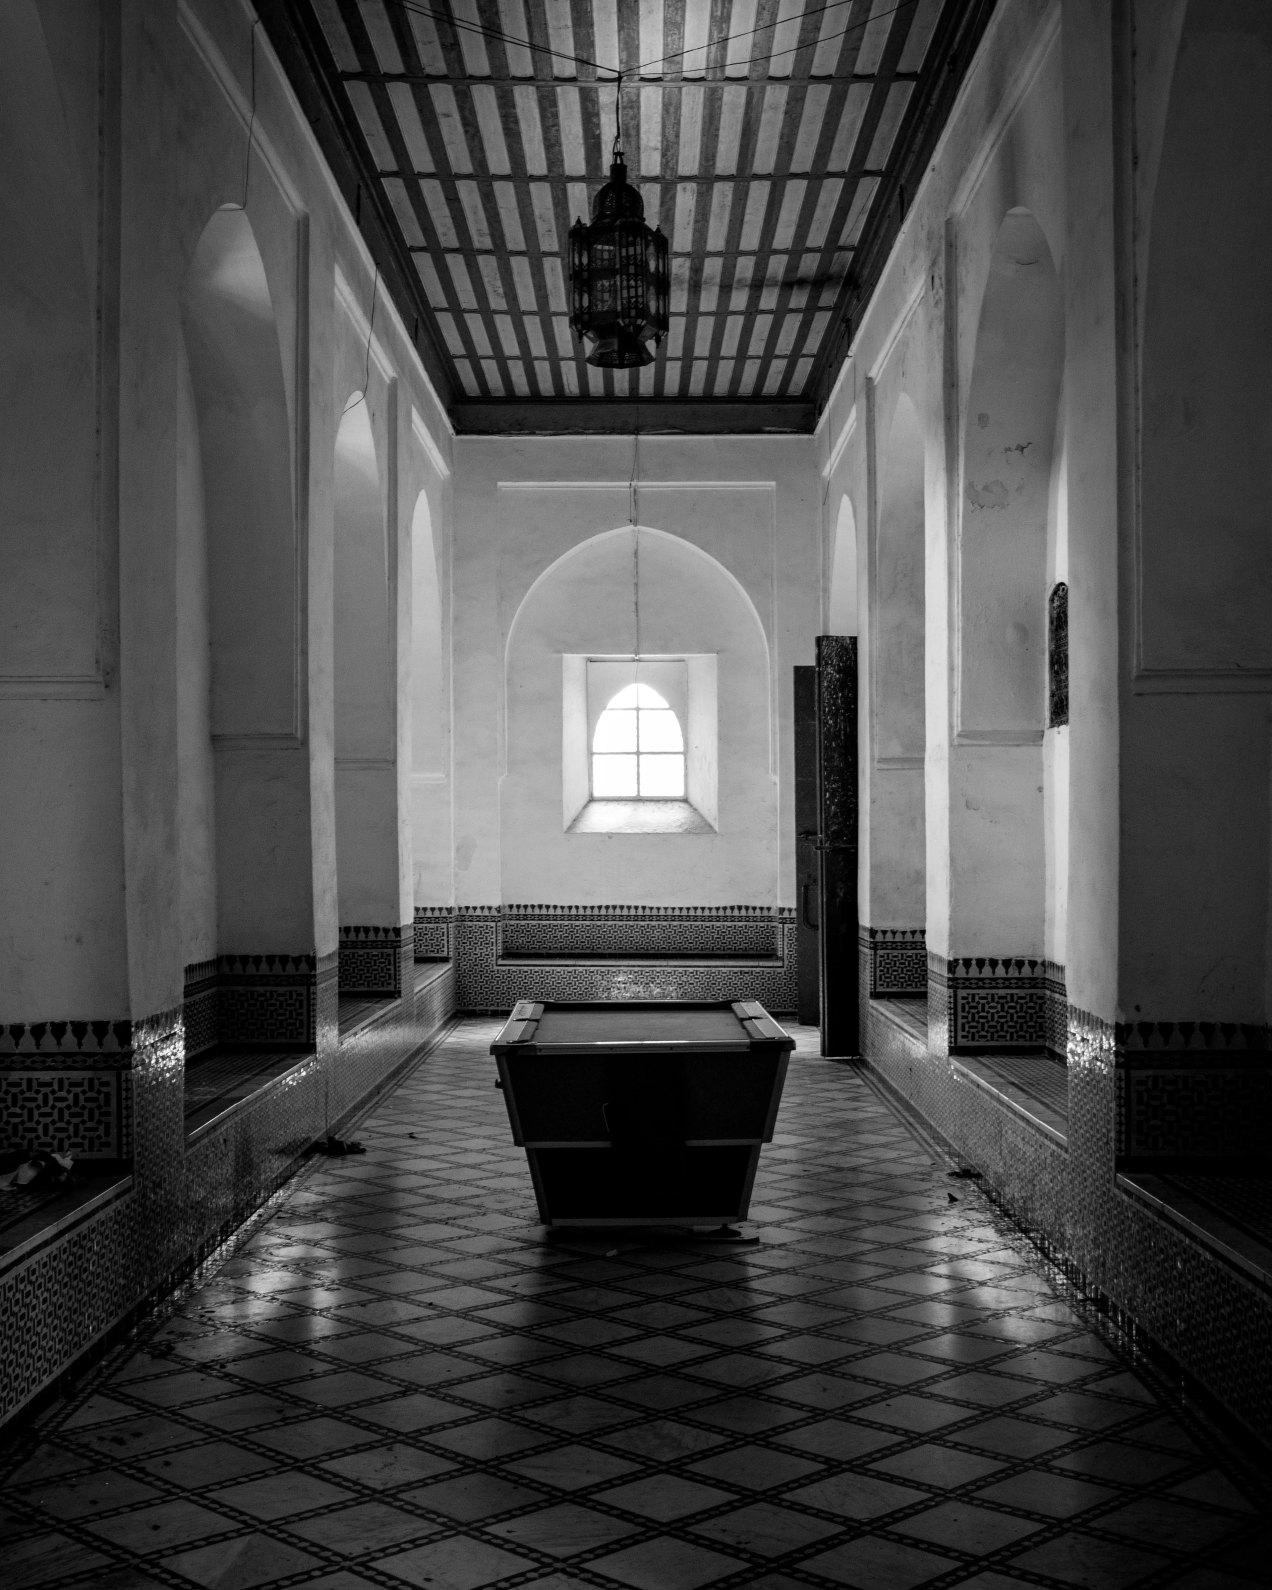 Entée du palais El Mokri, Fès, Maroc, gildalliere, 2020